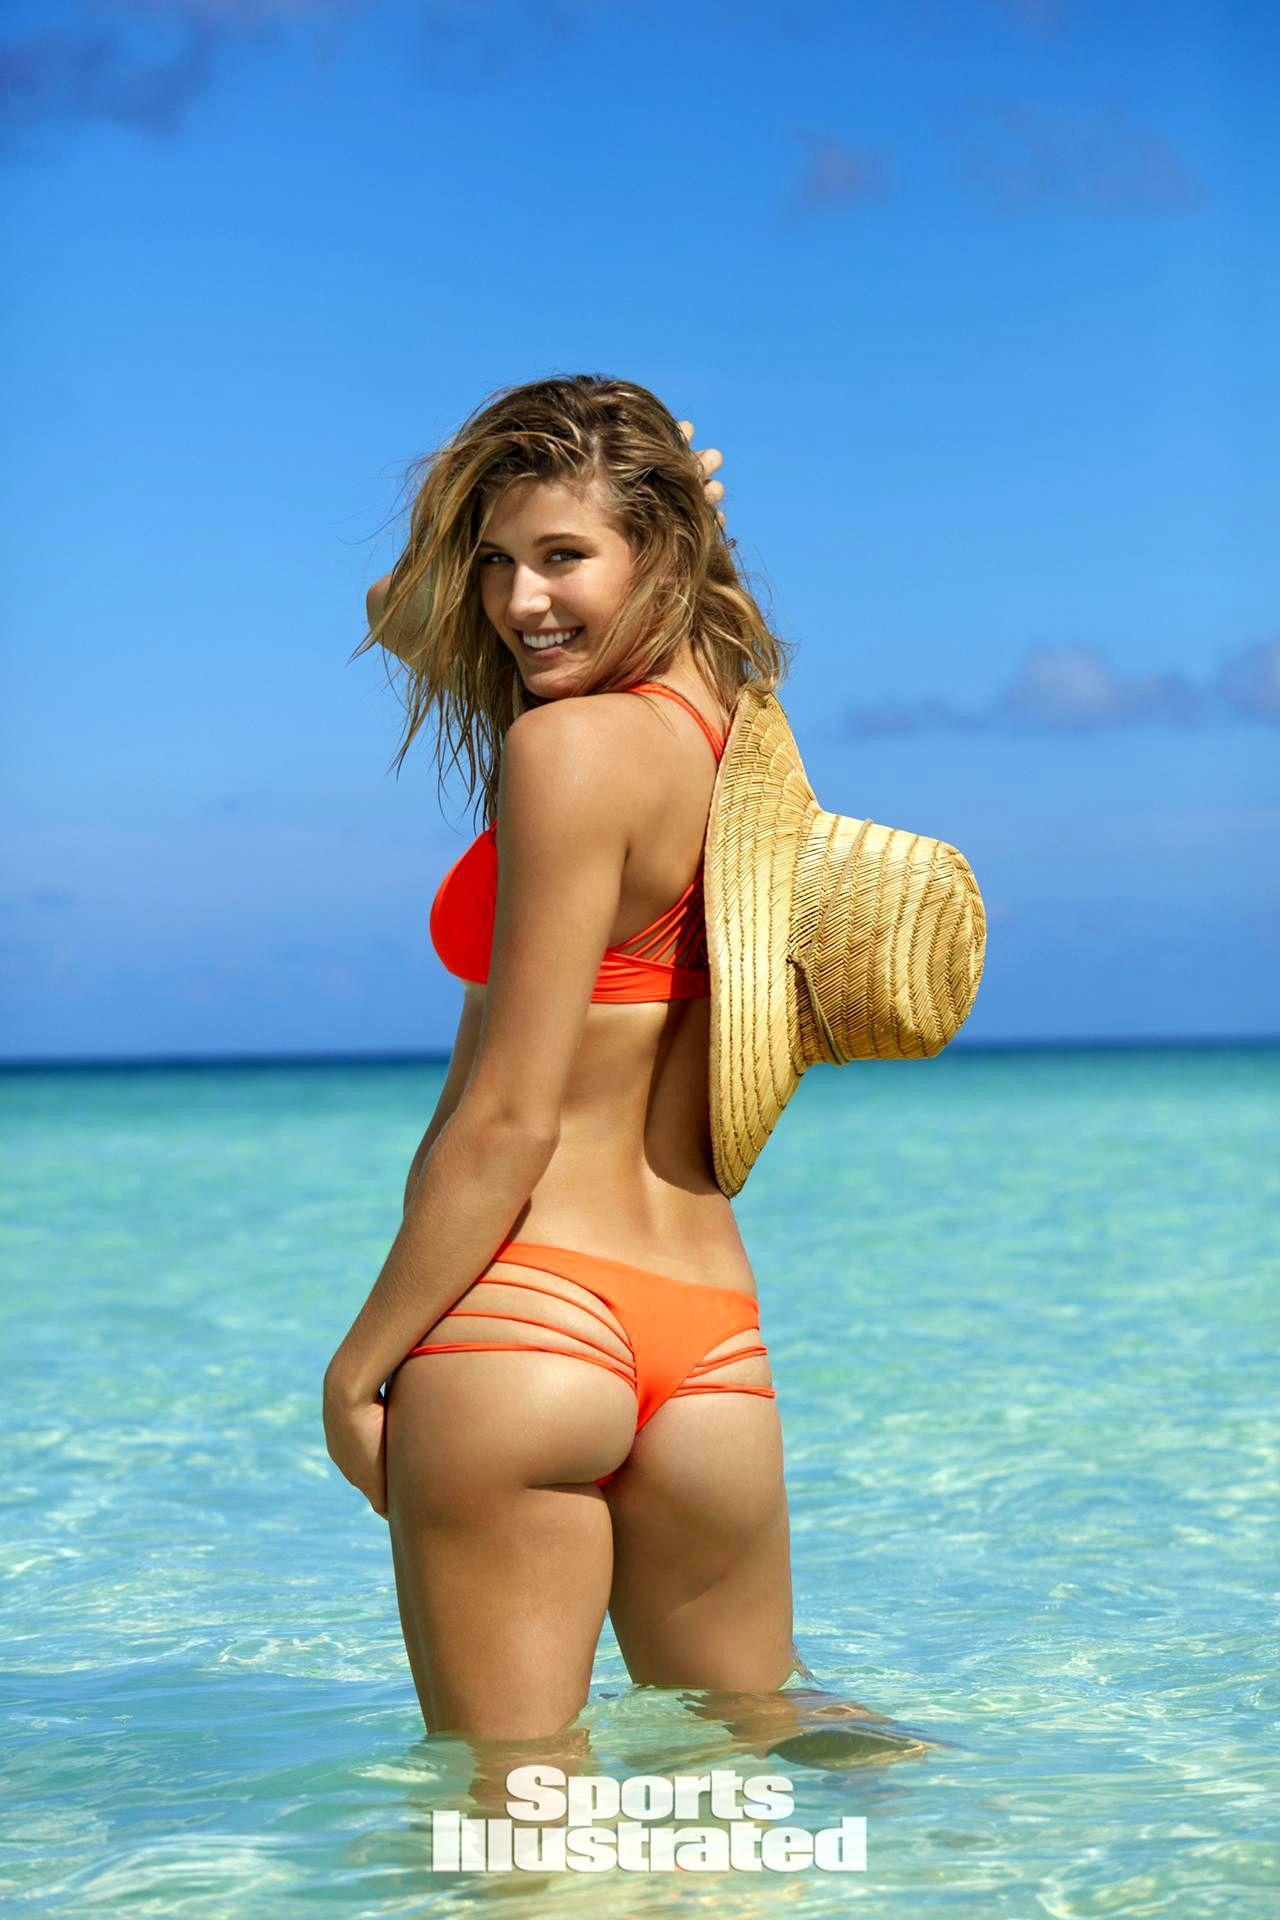 Ashley Judd Nude Photos Videos Sex tube Poll gigi paris vs solveig mork hansen,Yolanda hadid see through